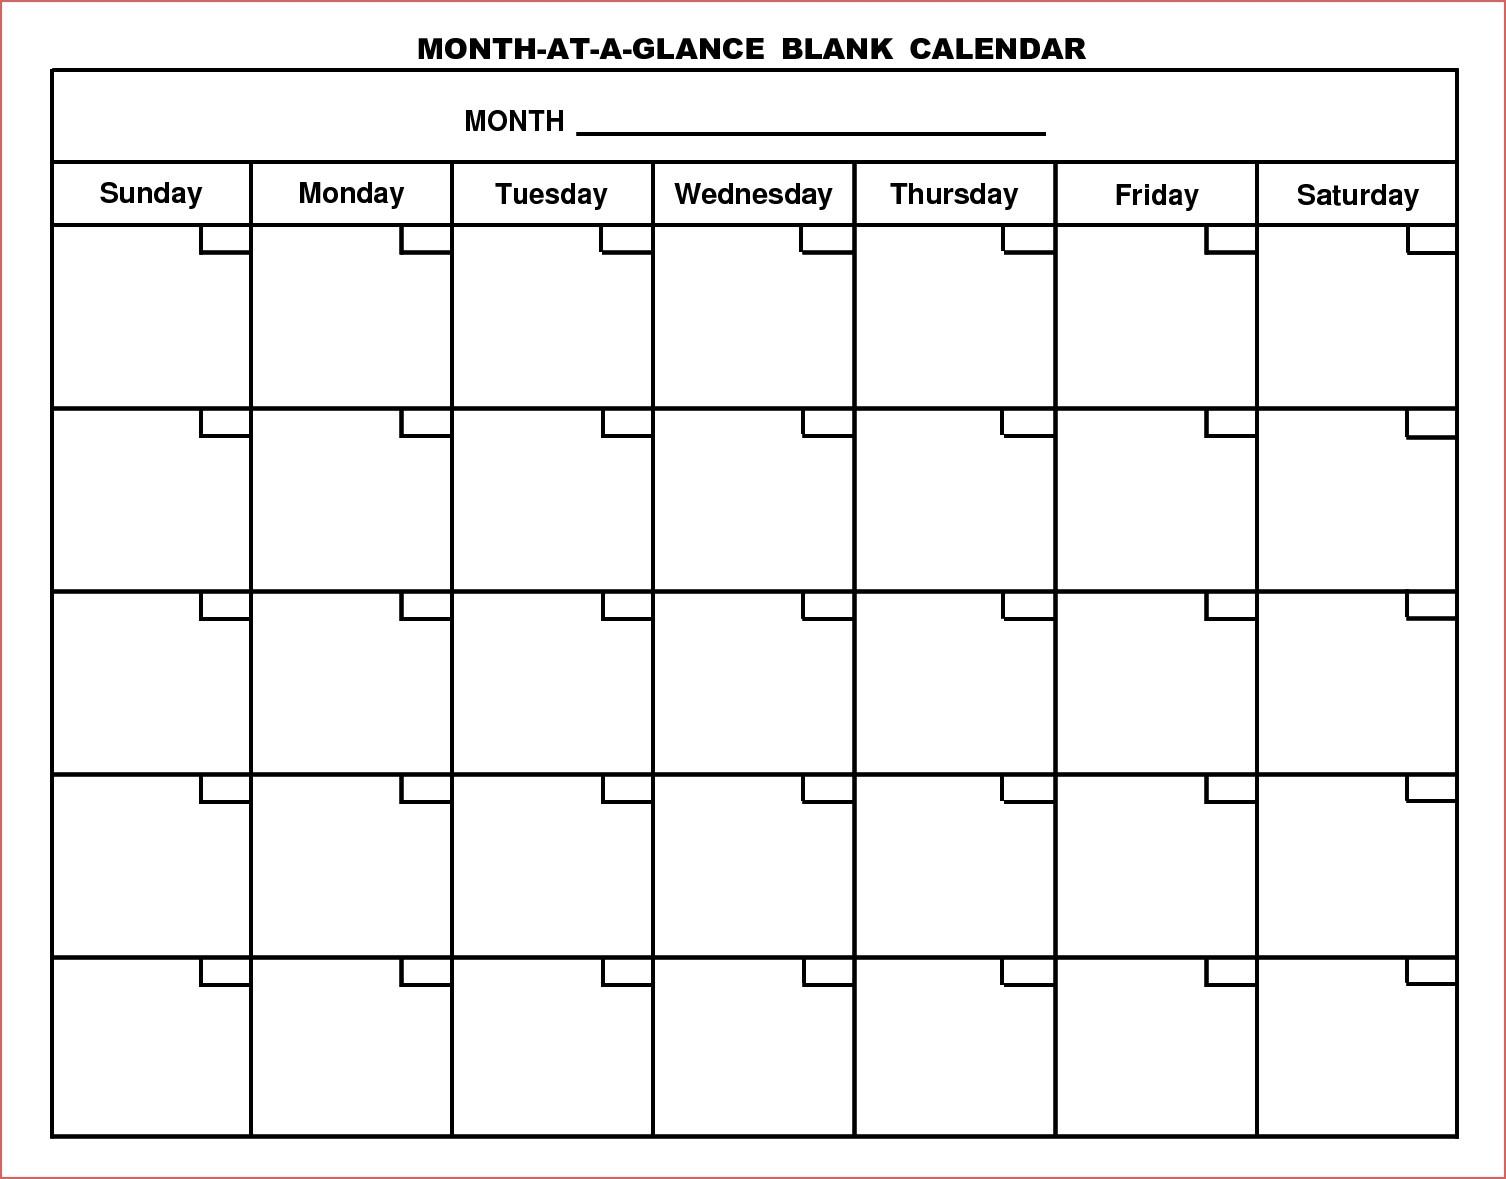 Free Blank Printable Calendar 2017 Printable Calendar Free Month within Full Size Blank Printable Calendar